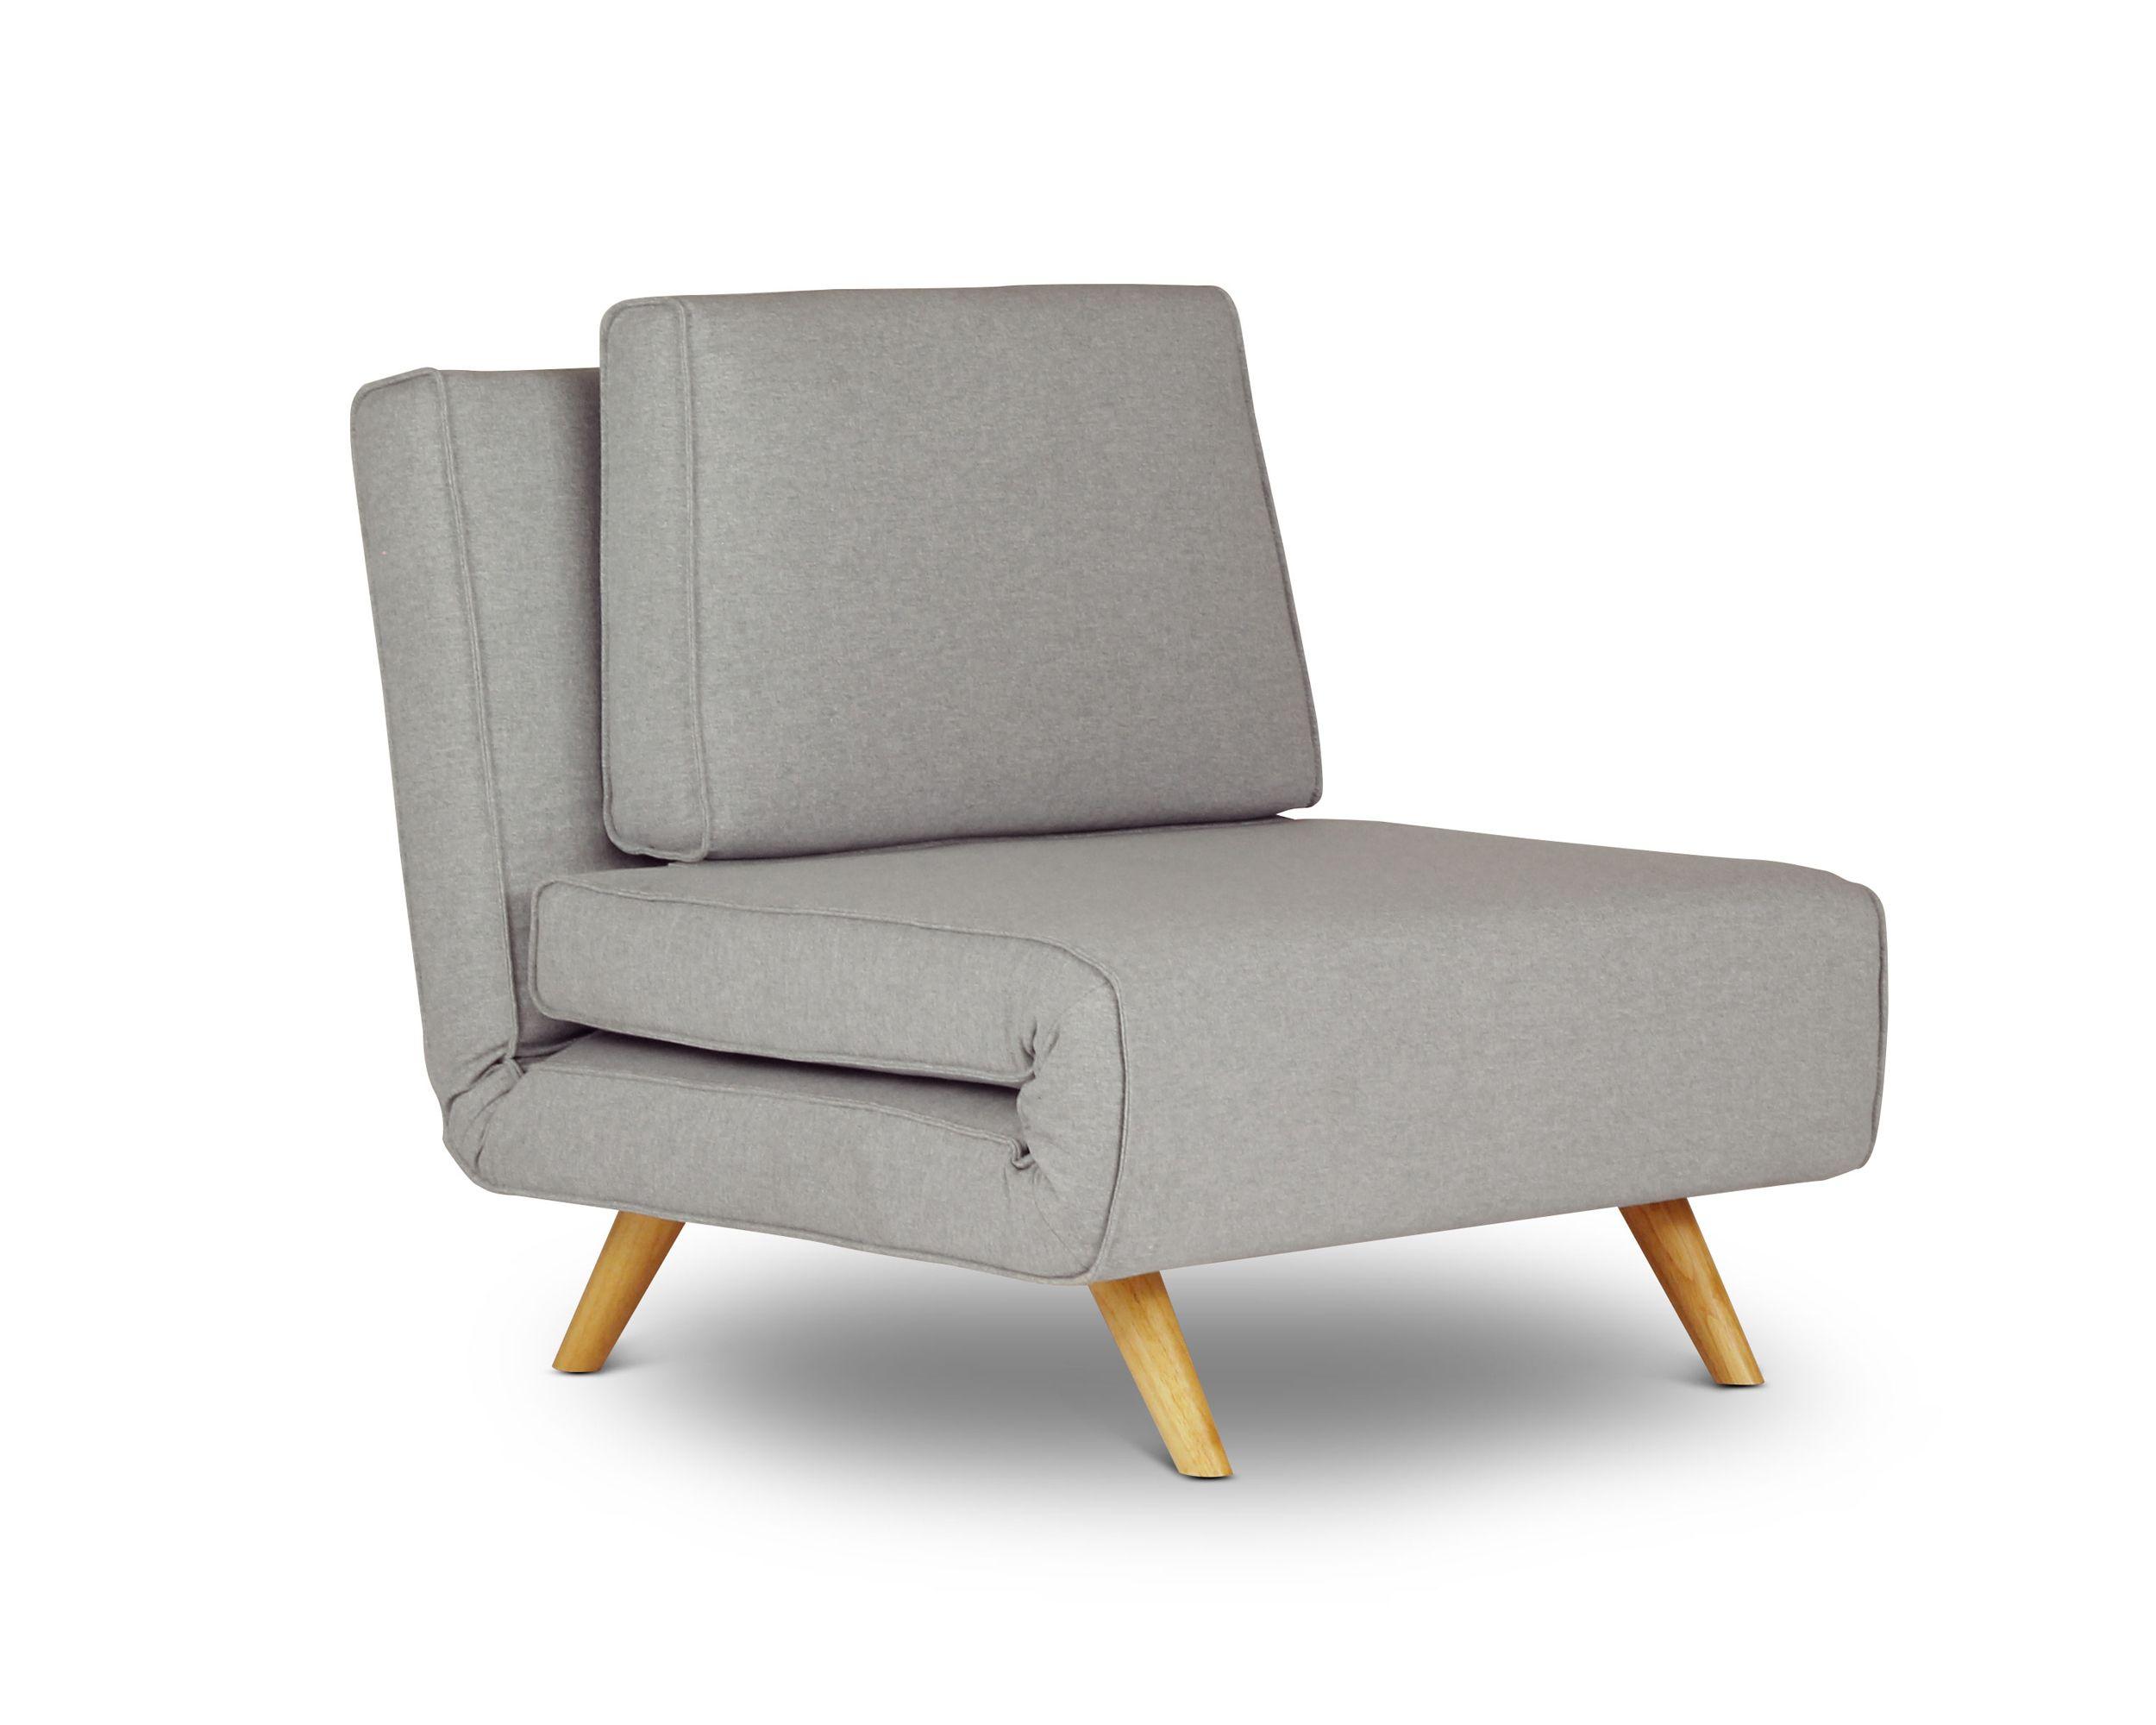 single seat sofa bed